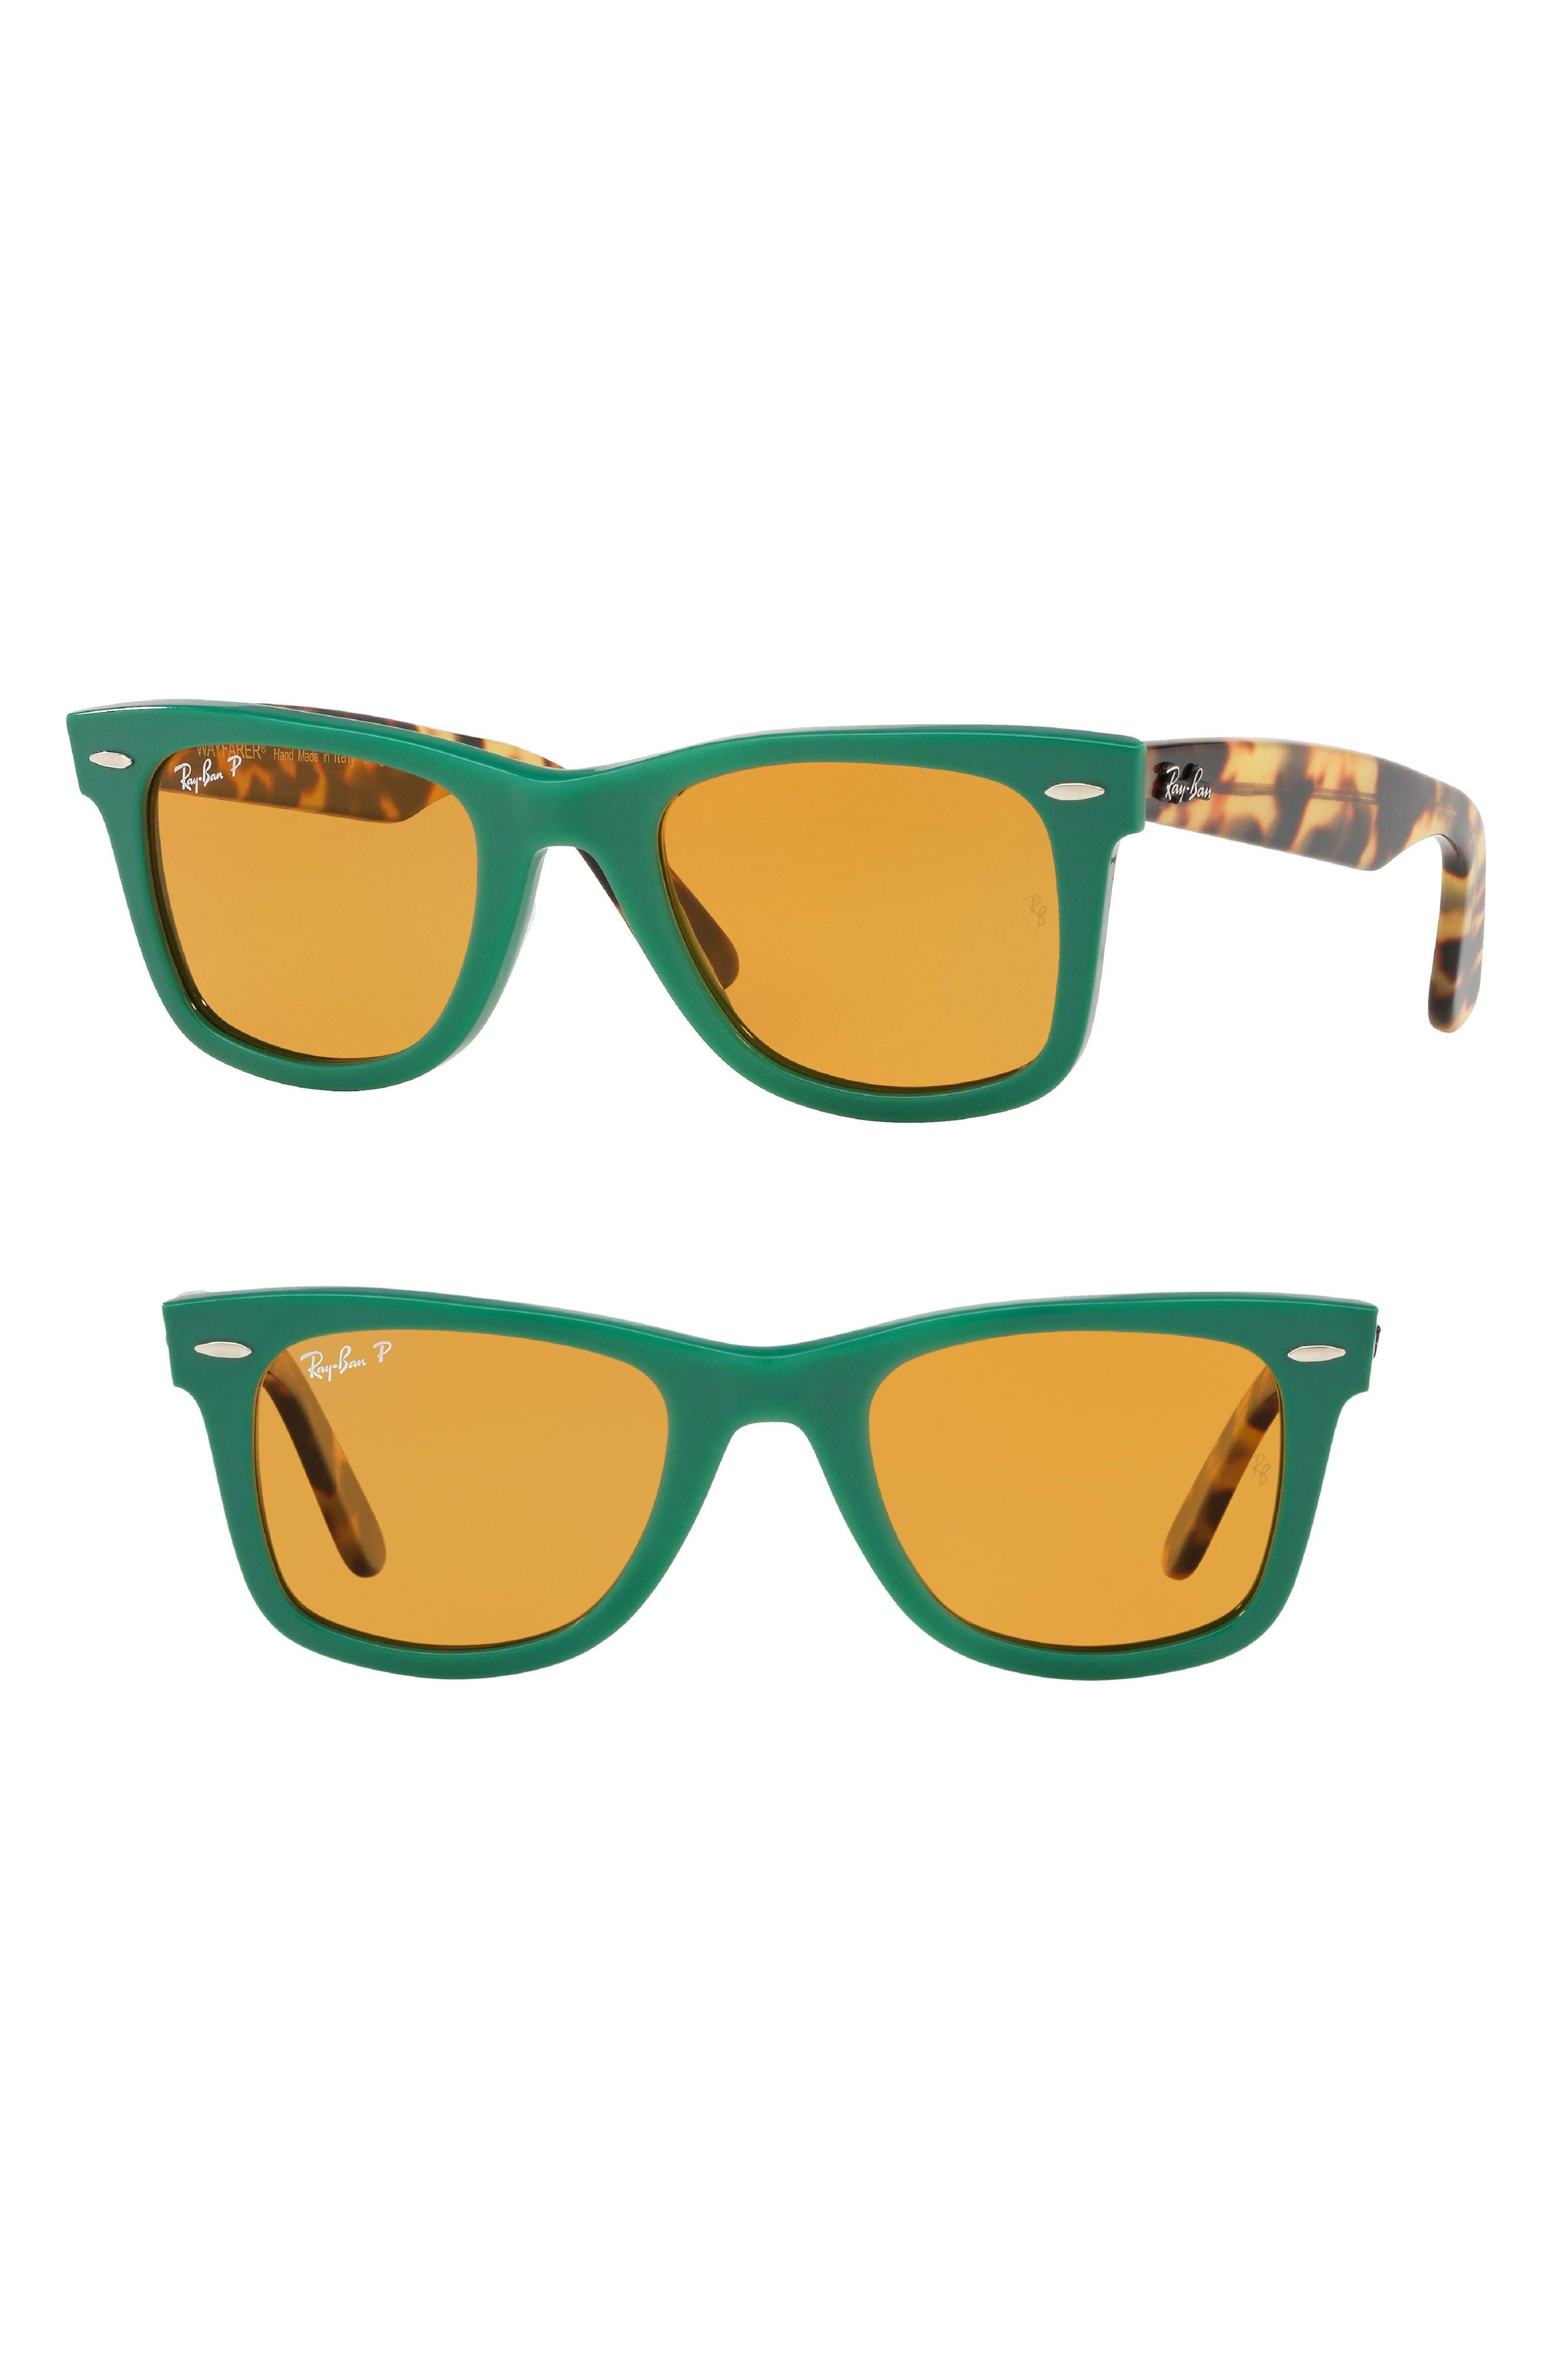 Standard Classic Wayfarer 50mm Polarized Sunglasses,                         Main,                         color, GREEN